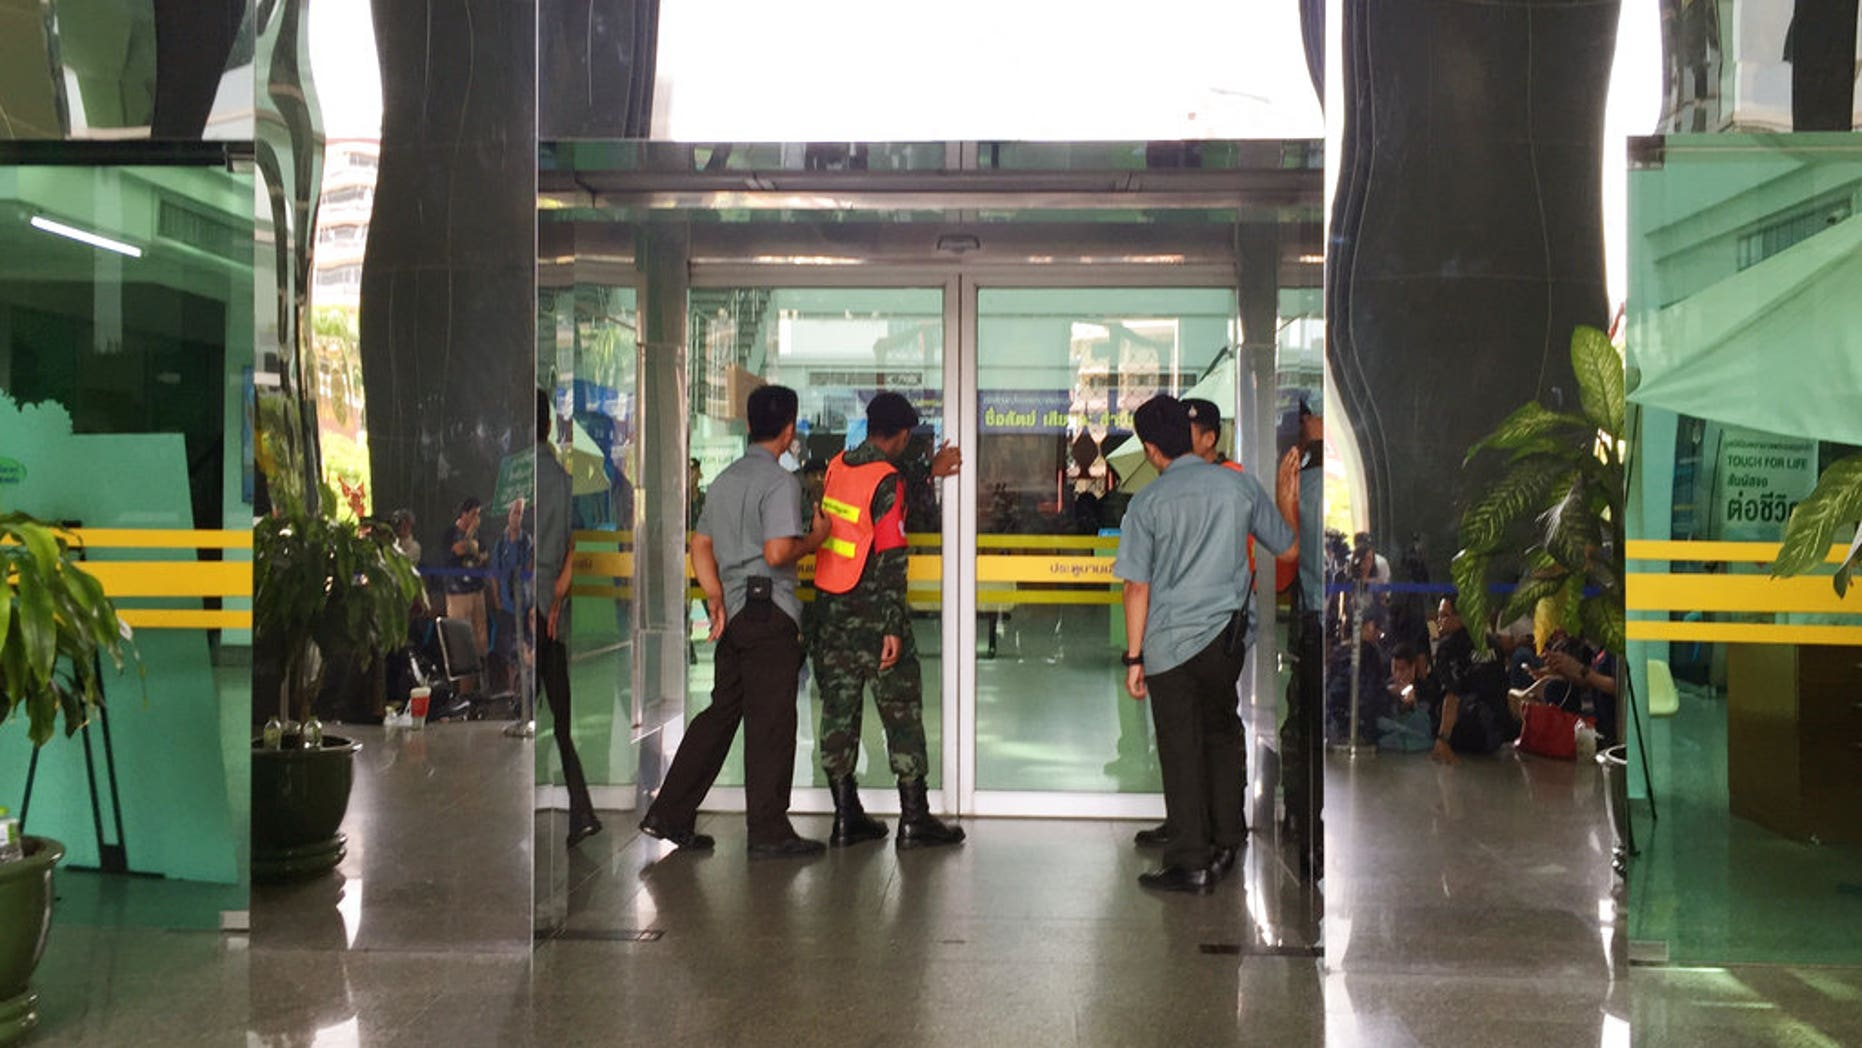 A bomb exploded at Phramongkutklao Hospital in Bangkok, wounding more than 20 people on Monday. (AP Photo/Sakchai Lalit)